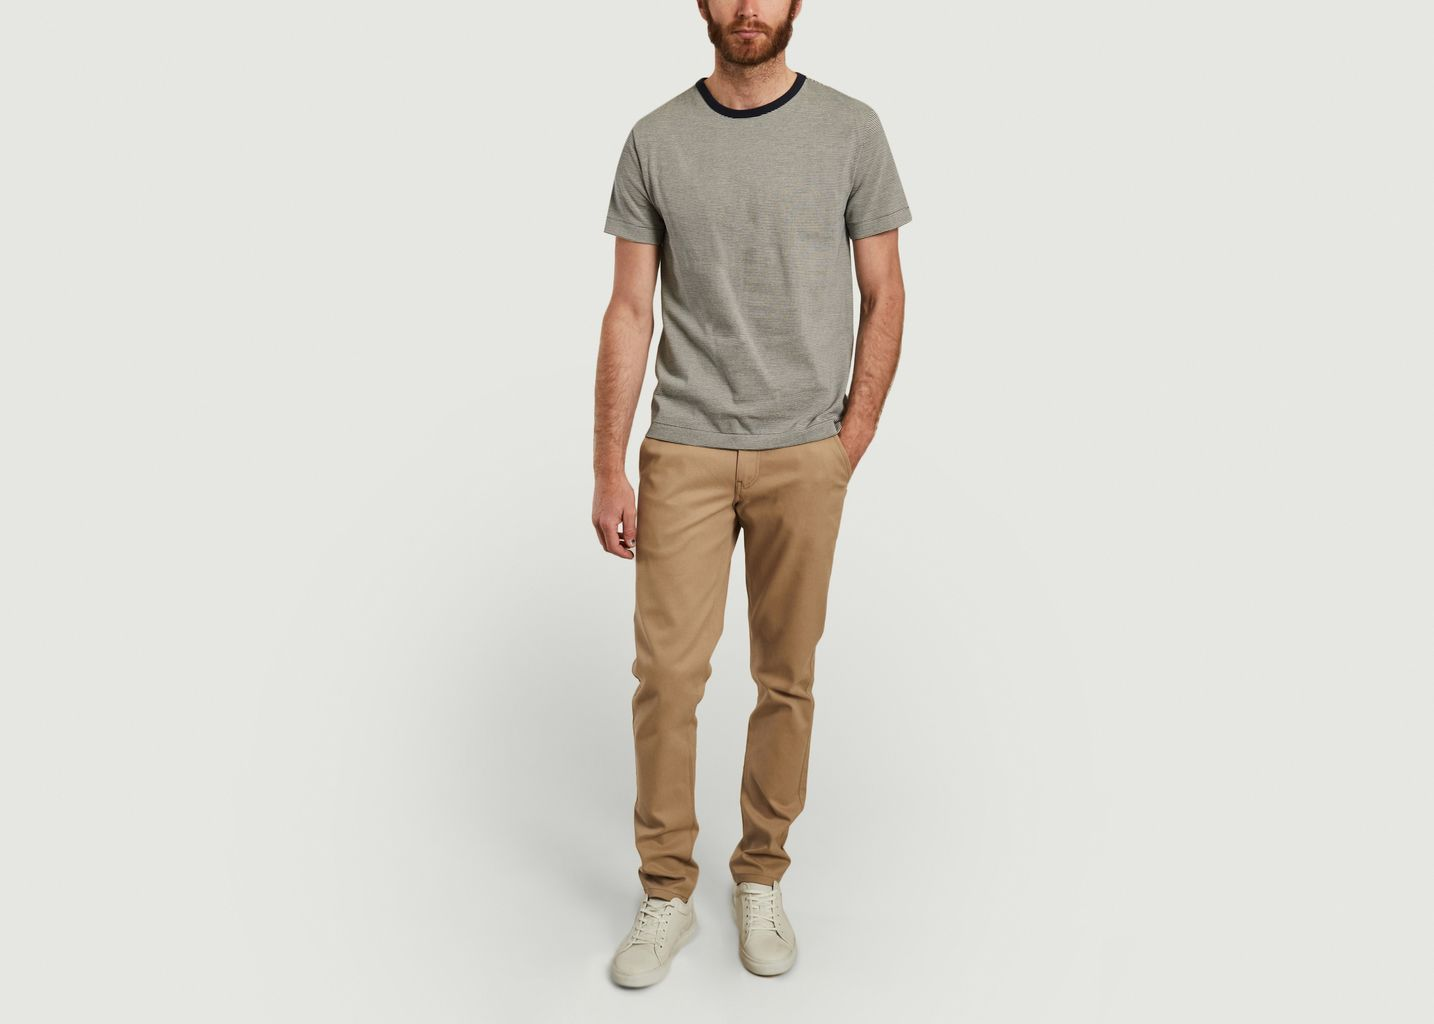 Pantalon Chino 163 - 1083